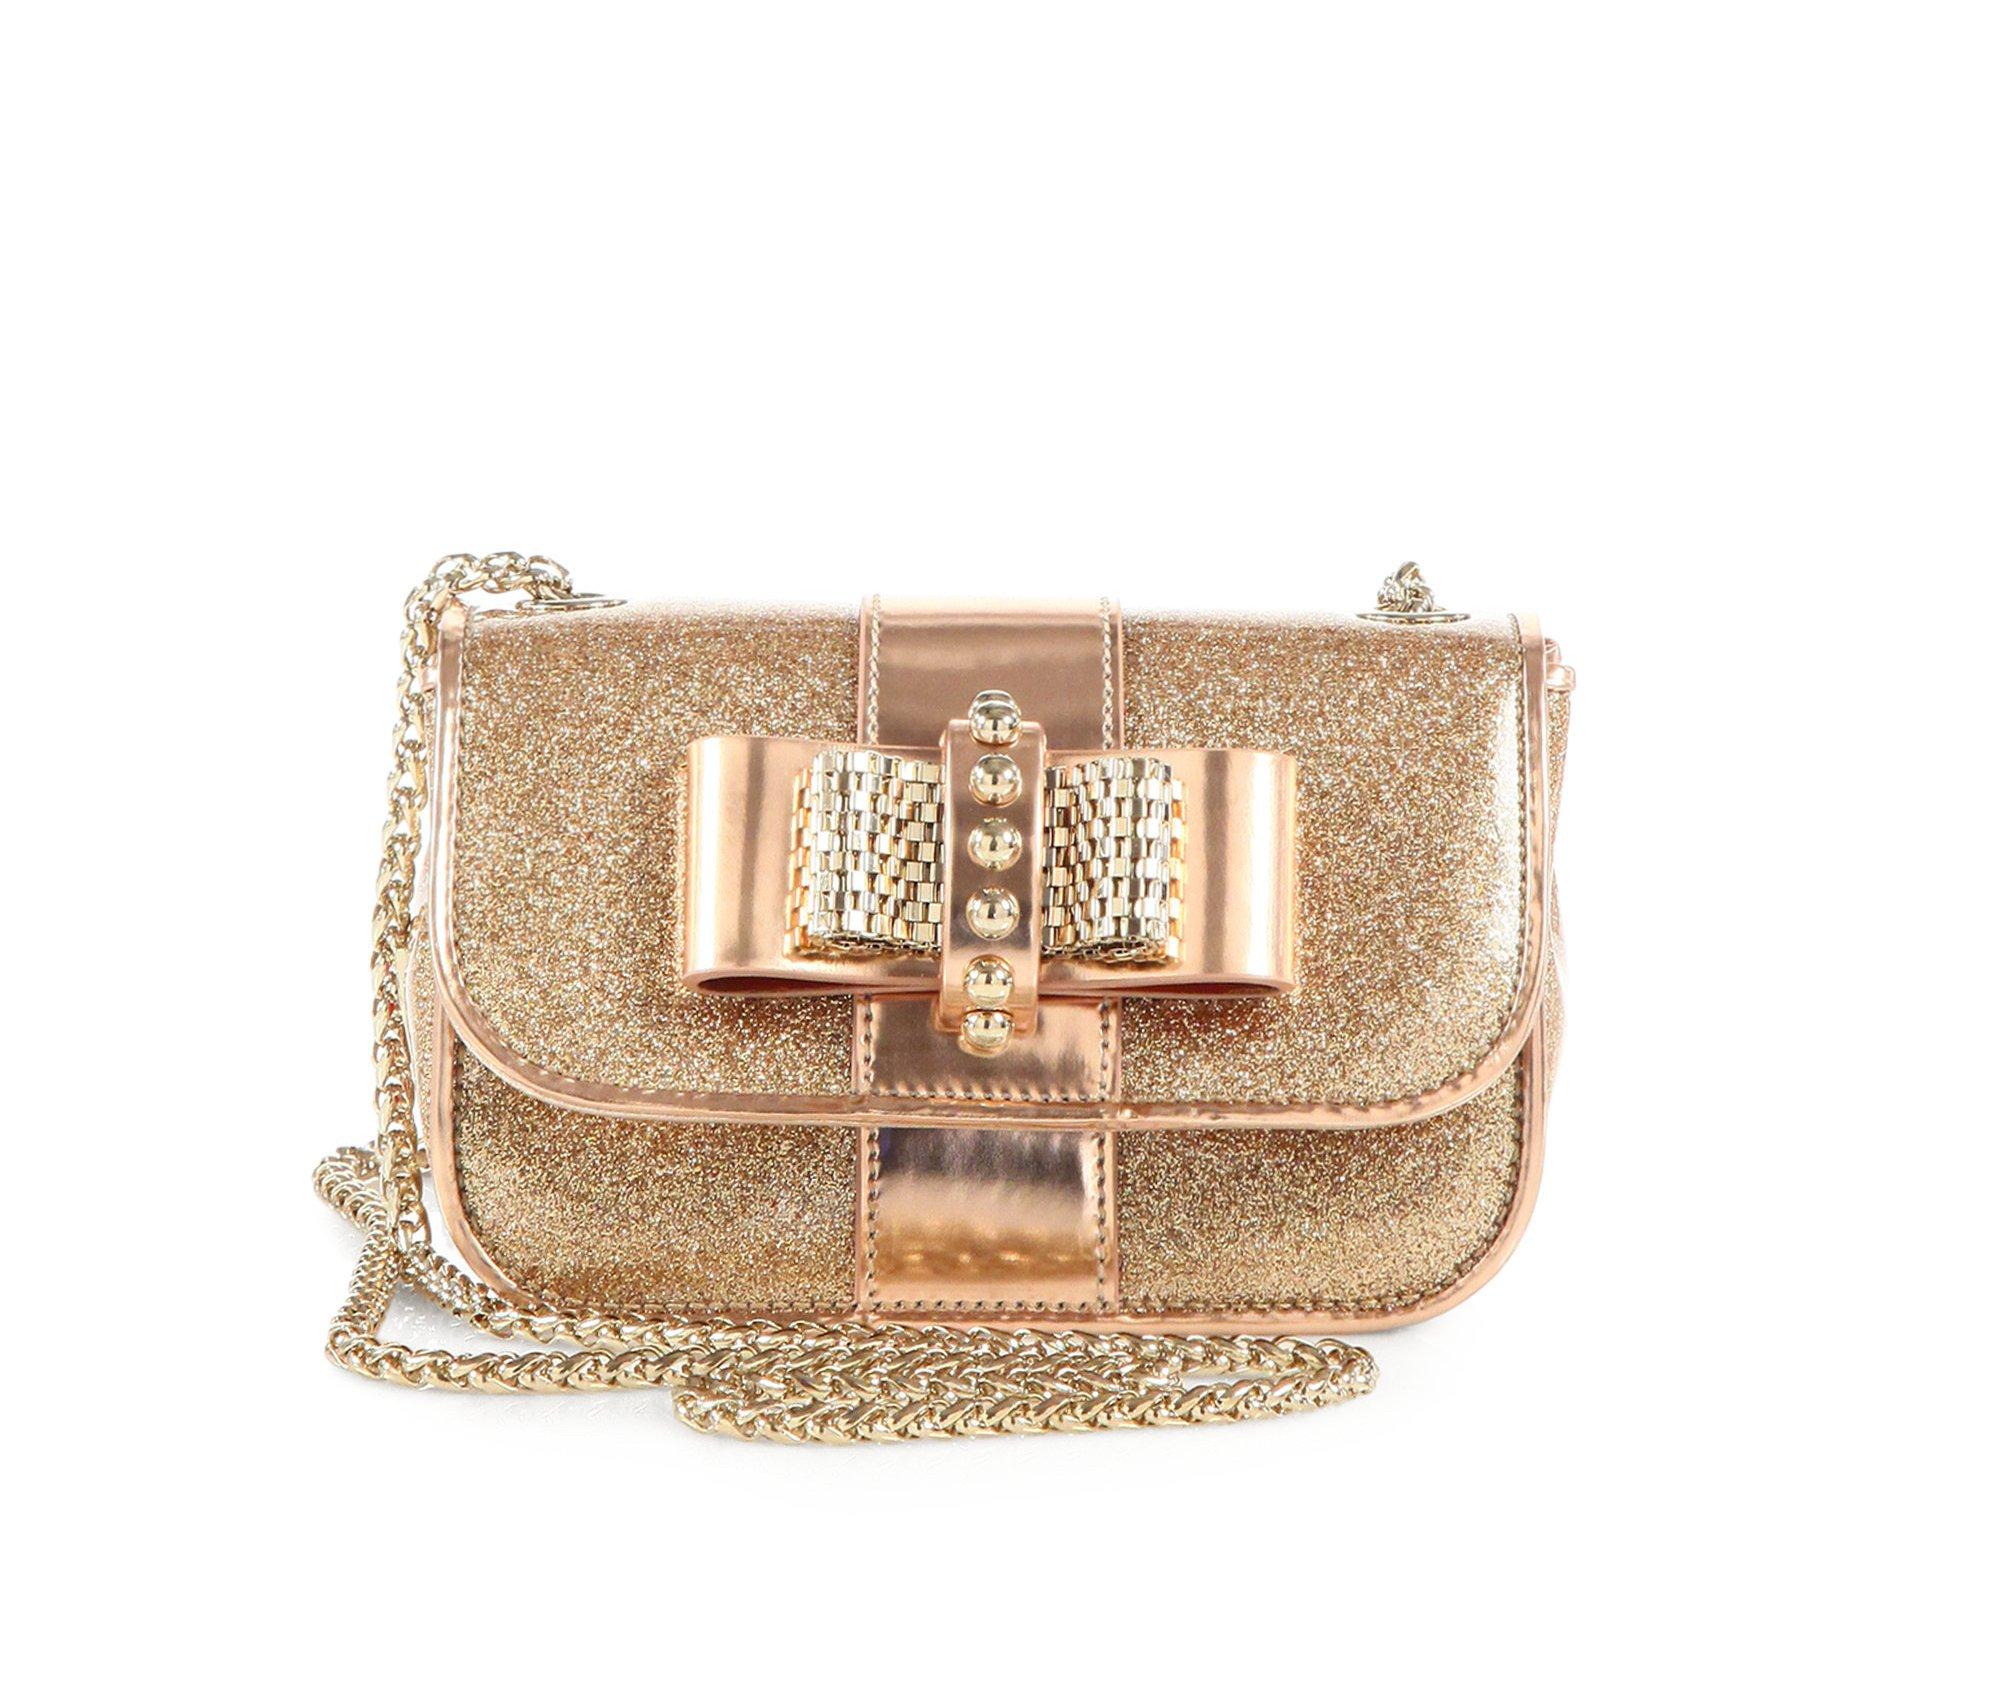 christian-louboutin-gold-sweet-charity-glitter-mini-shoulder-bag-product-1-17445629-0-081896126-normal